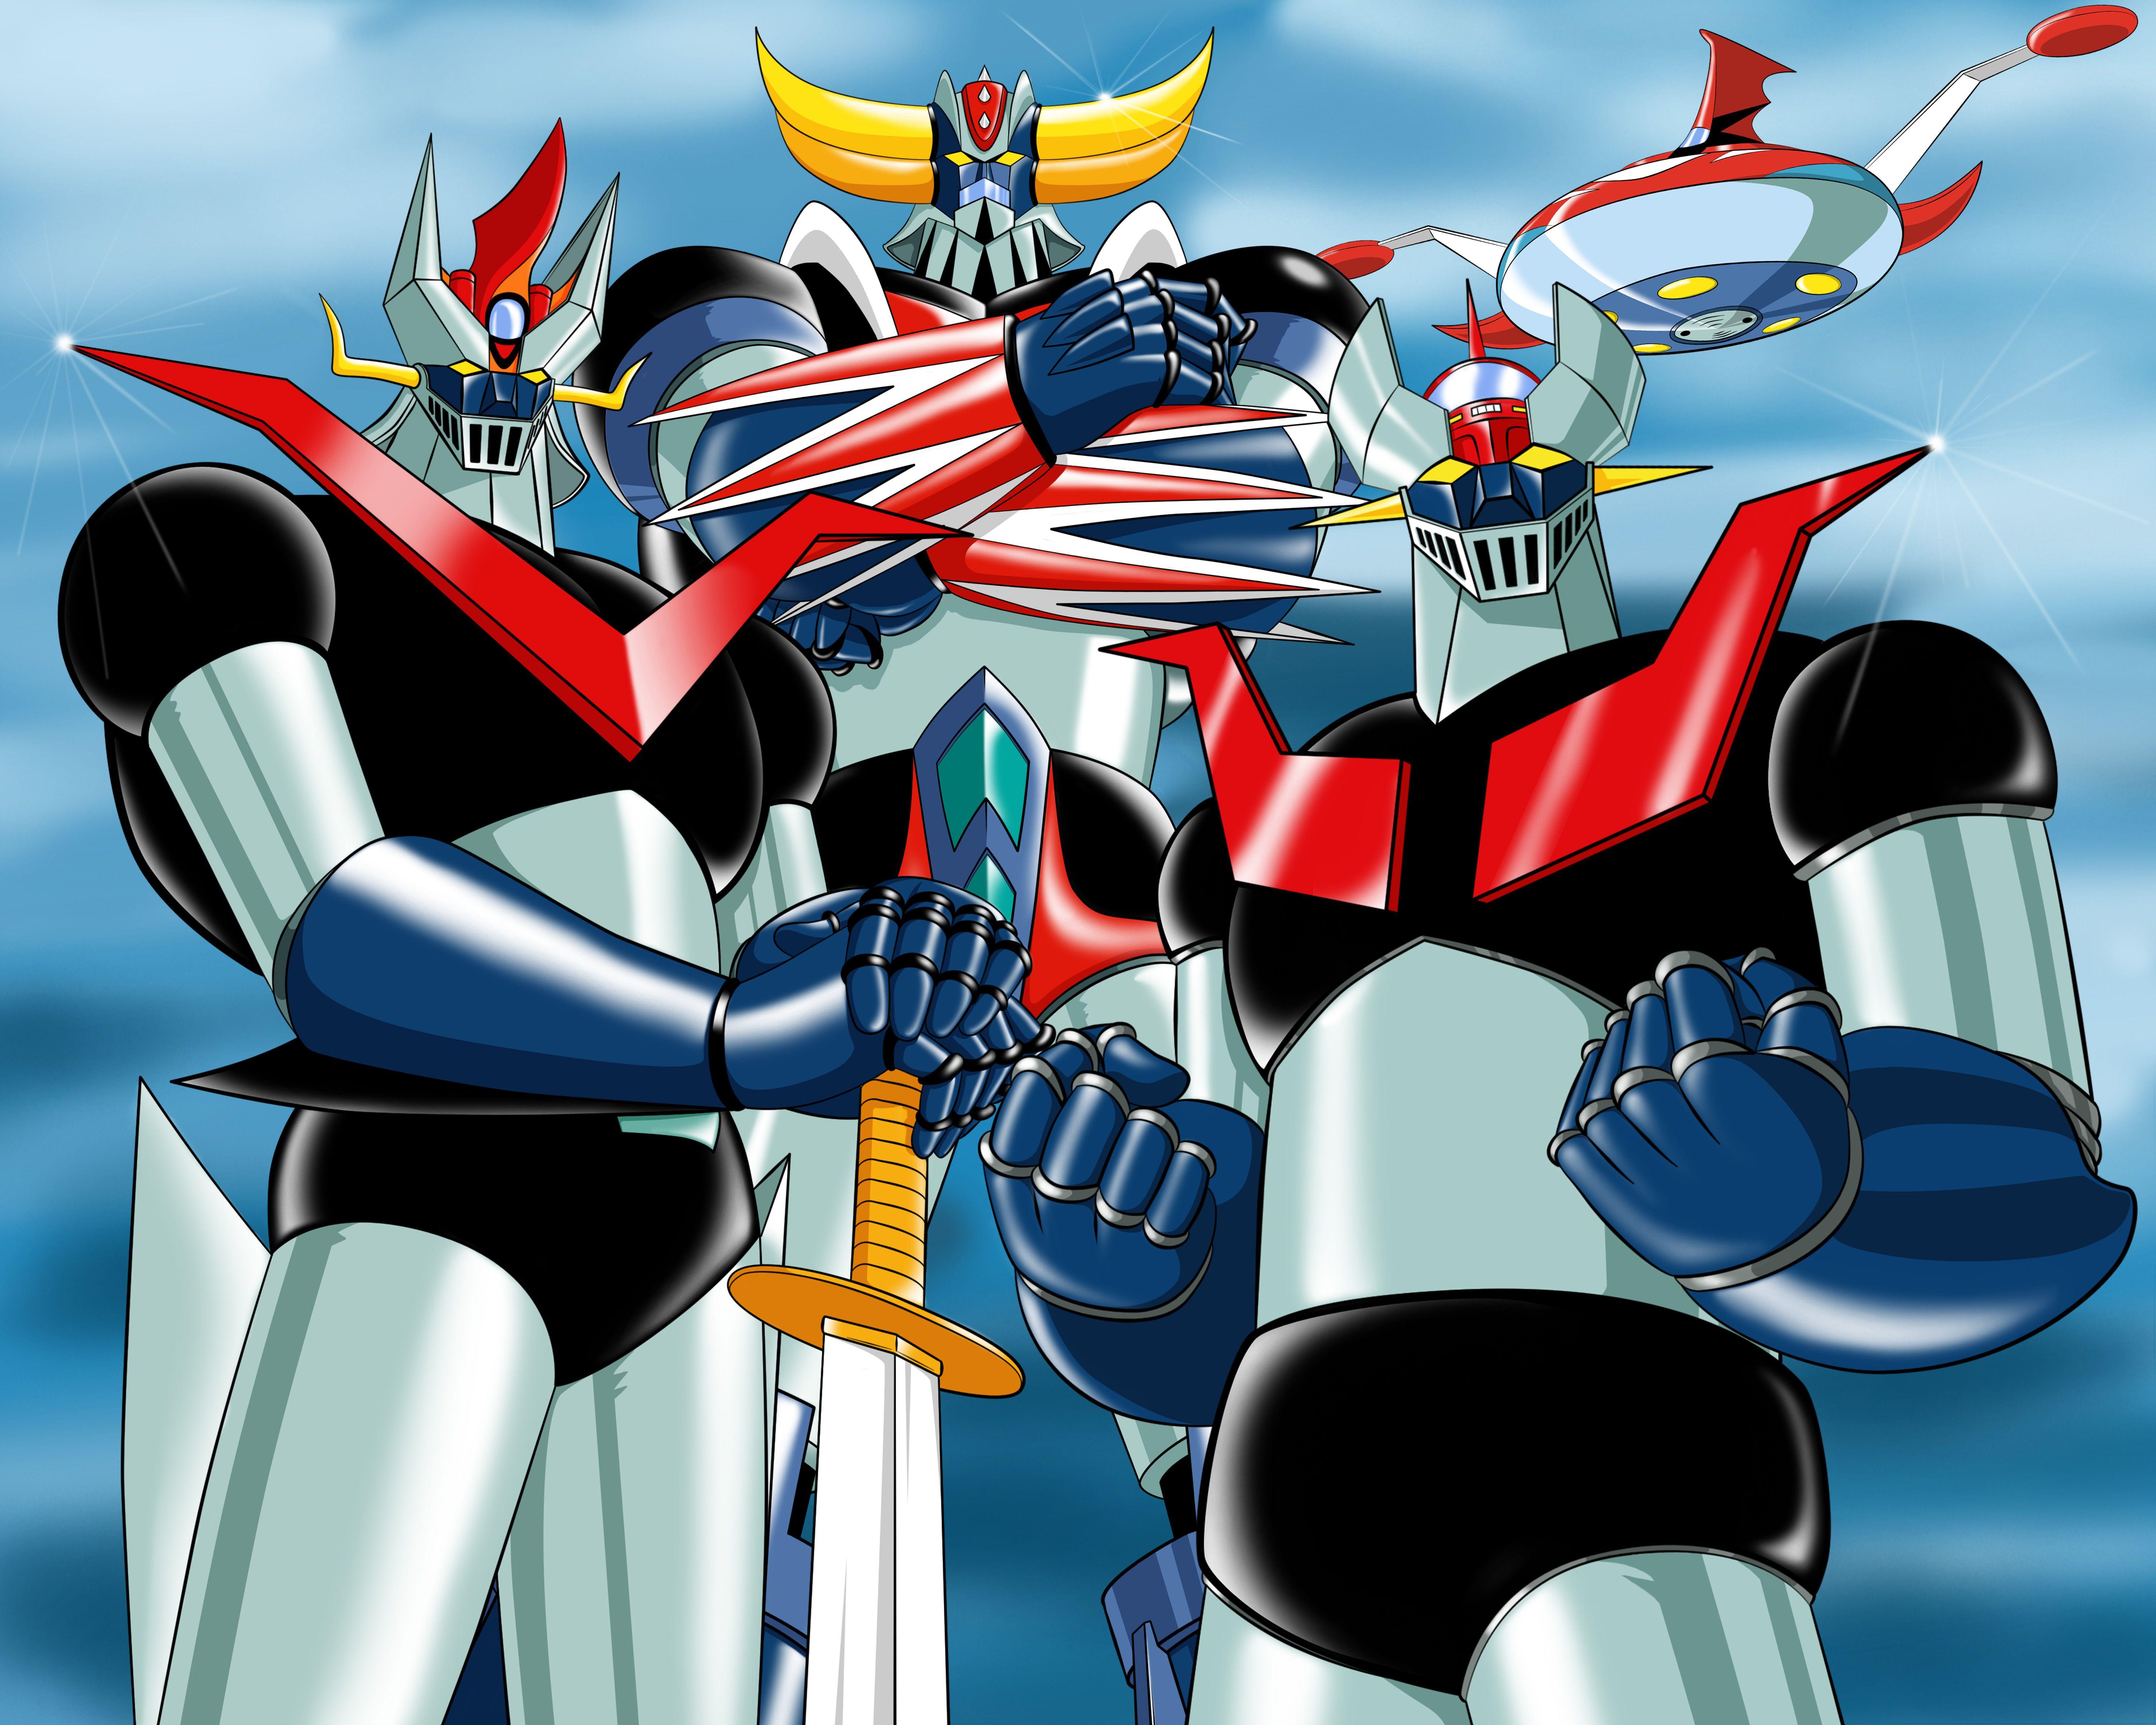 Mazinger great grendizer robots and mech